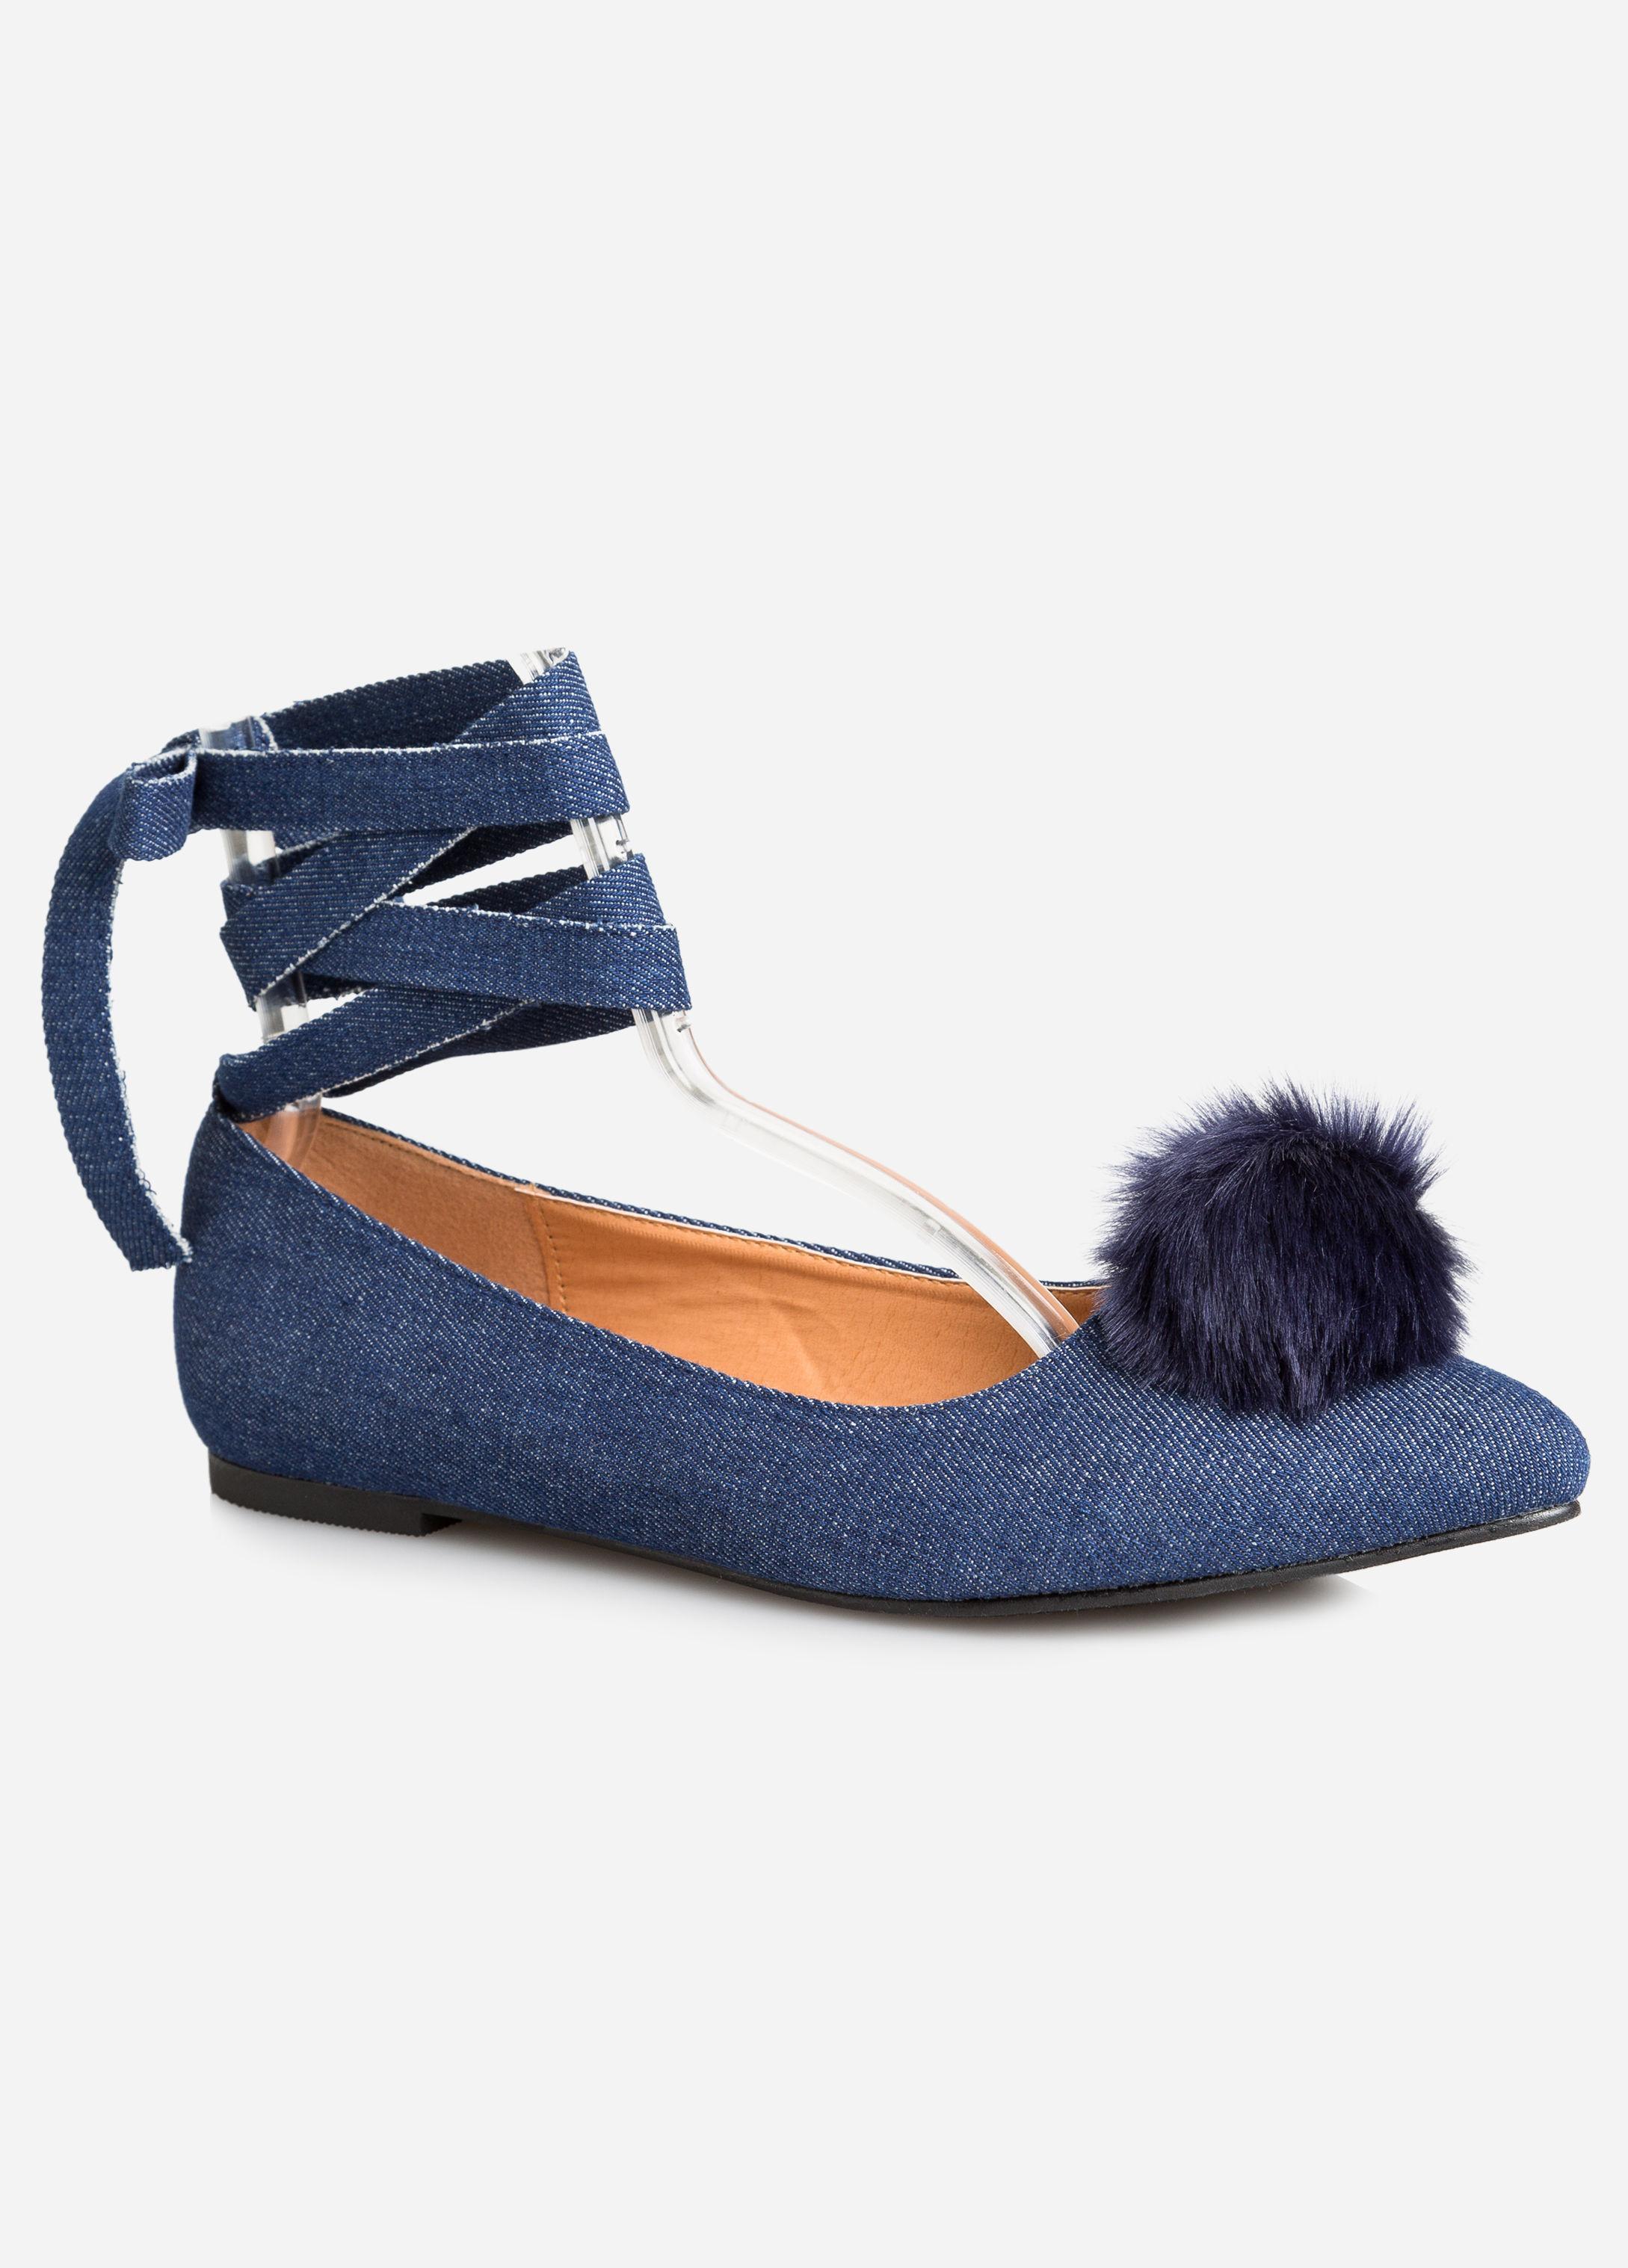 Ashley Stewart Flat Shoes